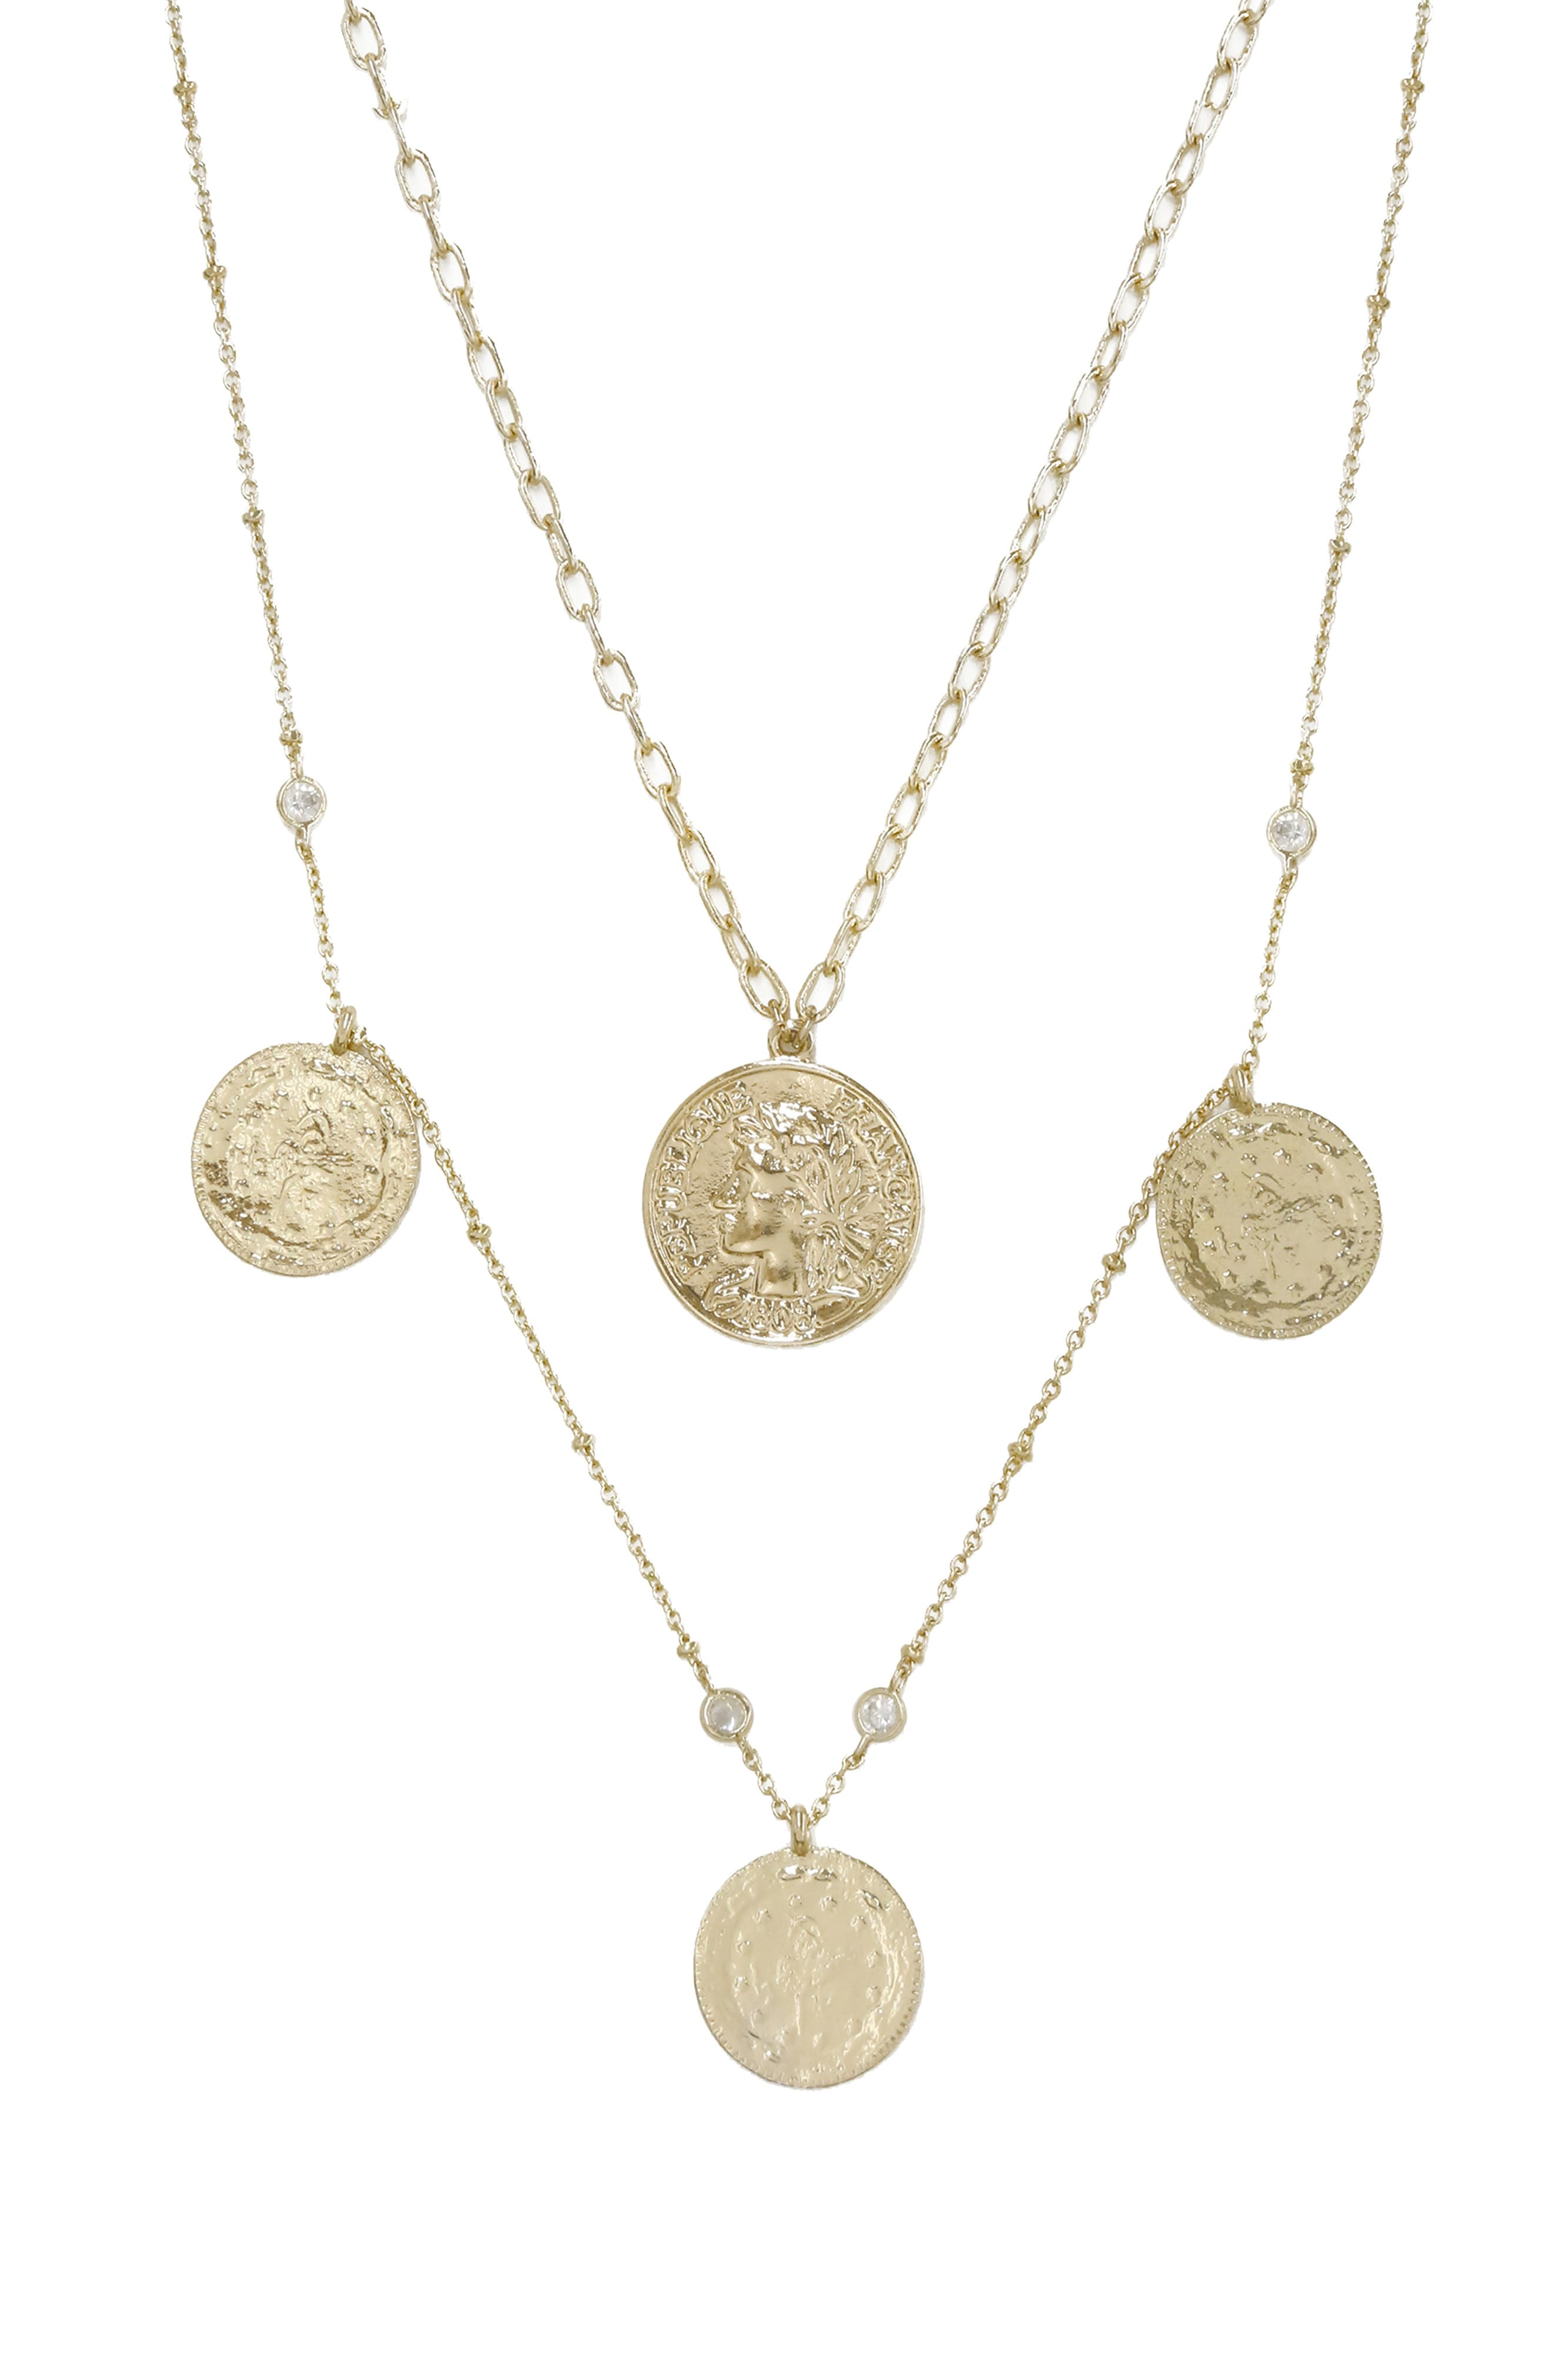 Ettika Set Of 2 Coin Pendant Necklaces Nordstrom In 2021 Coin Pendant Necklace Coin Pendant Fashion Necklace